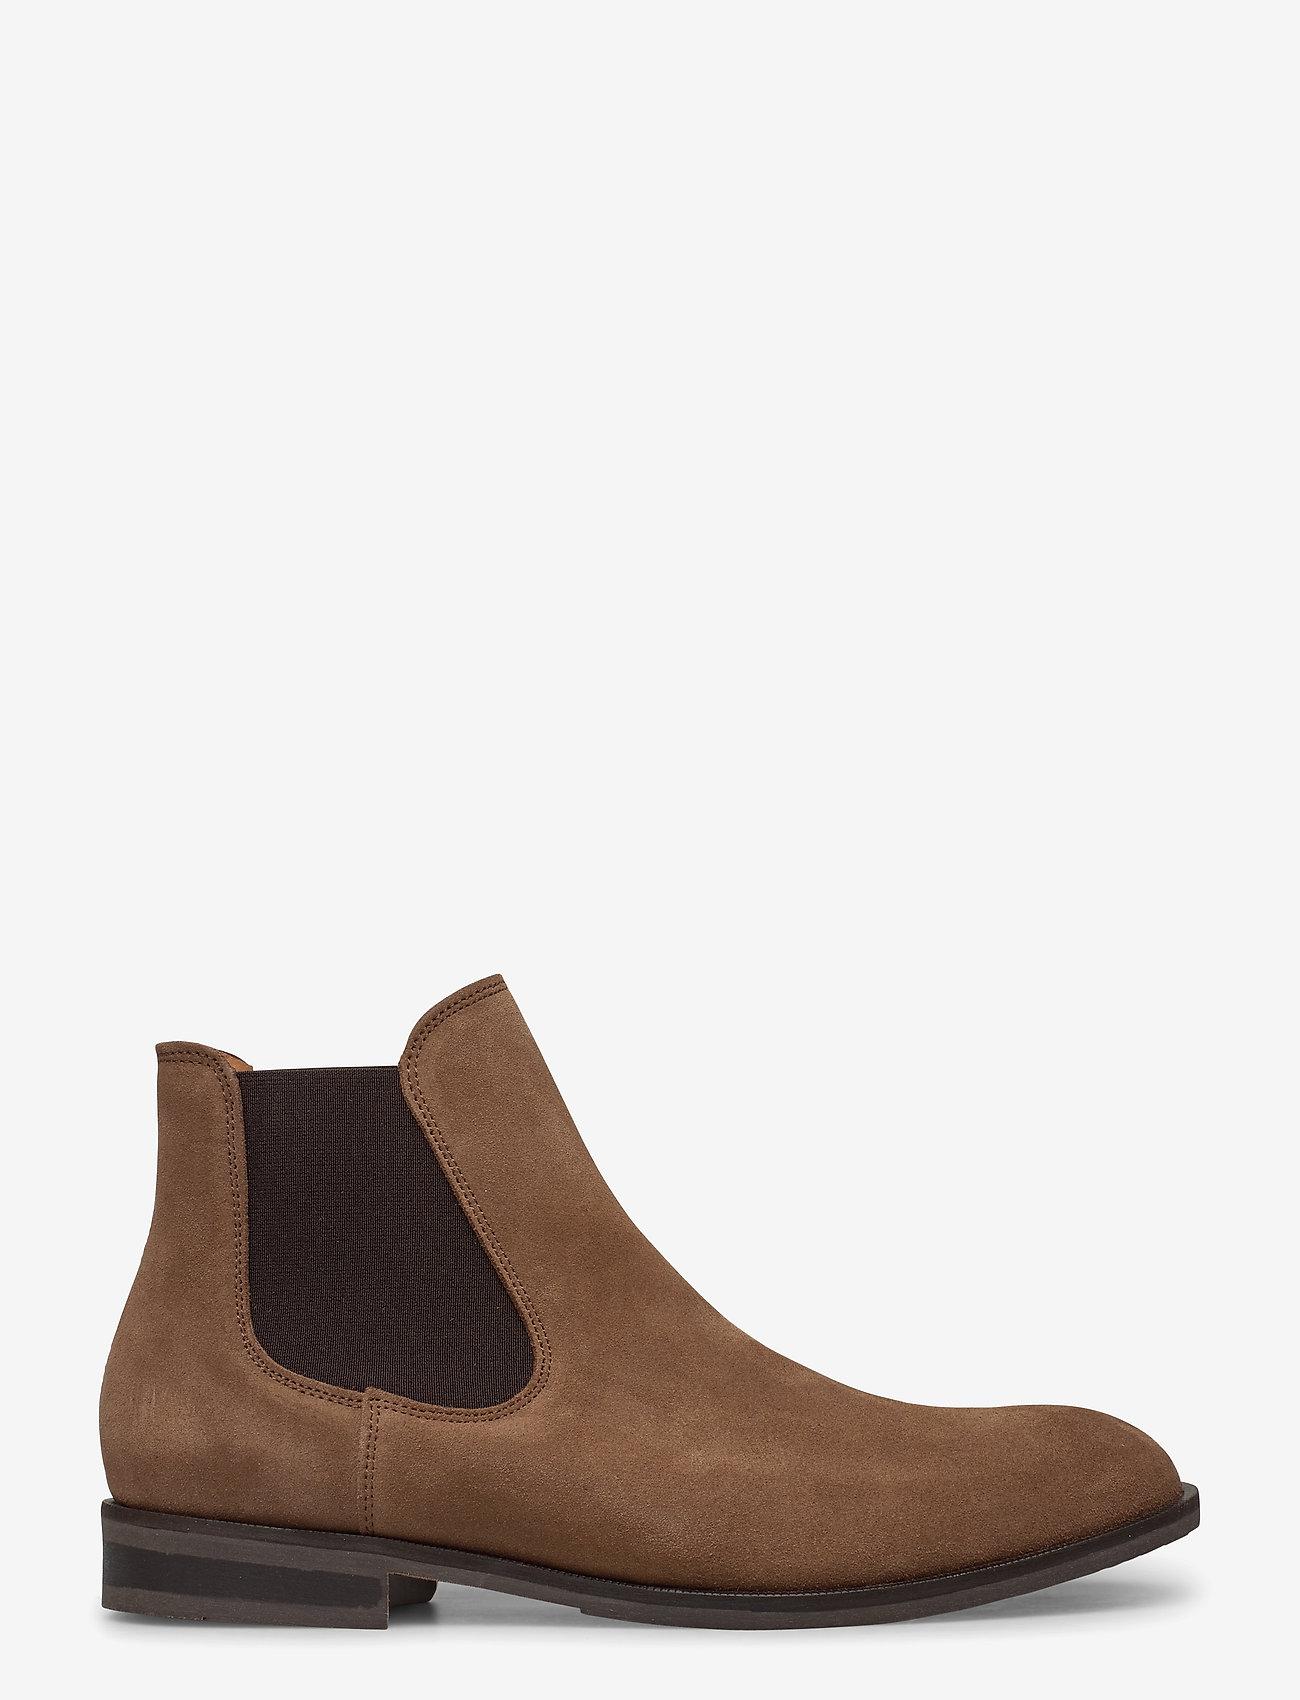 Selected Homme - SLHLOUIS SUEDE CHELSEA BOOT B NOOS - chelsea boots - cognac - 1